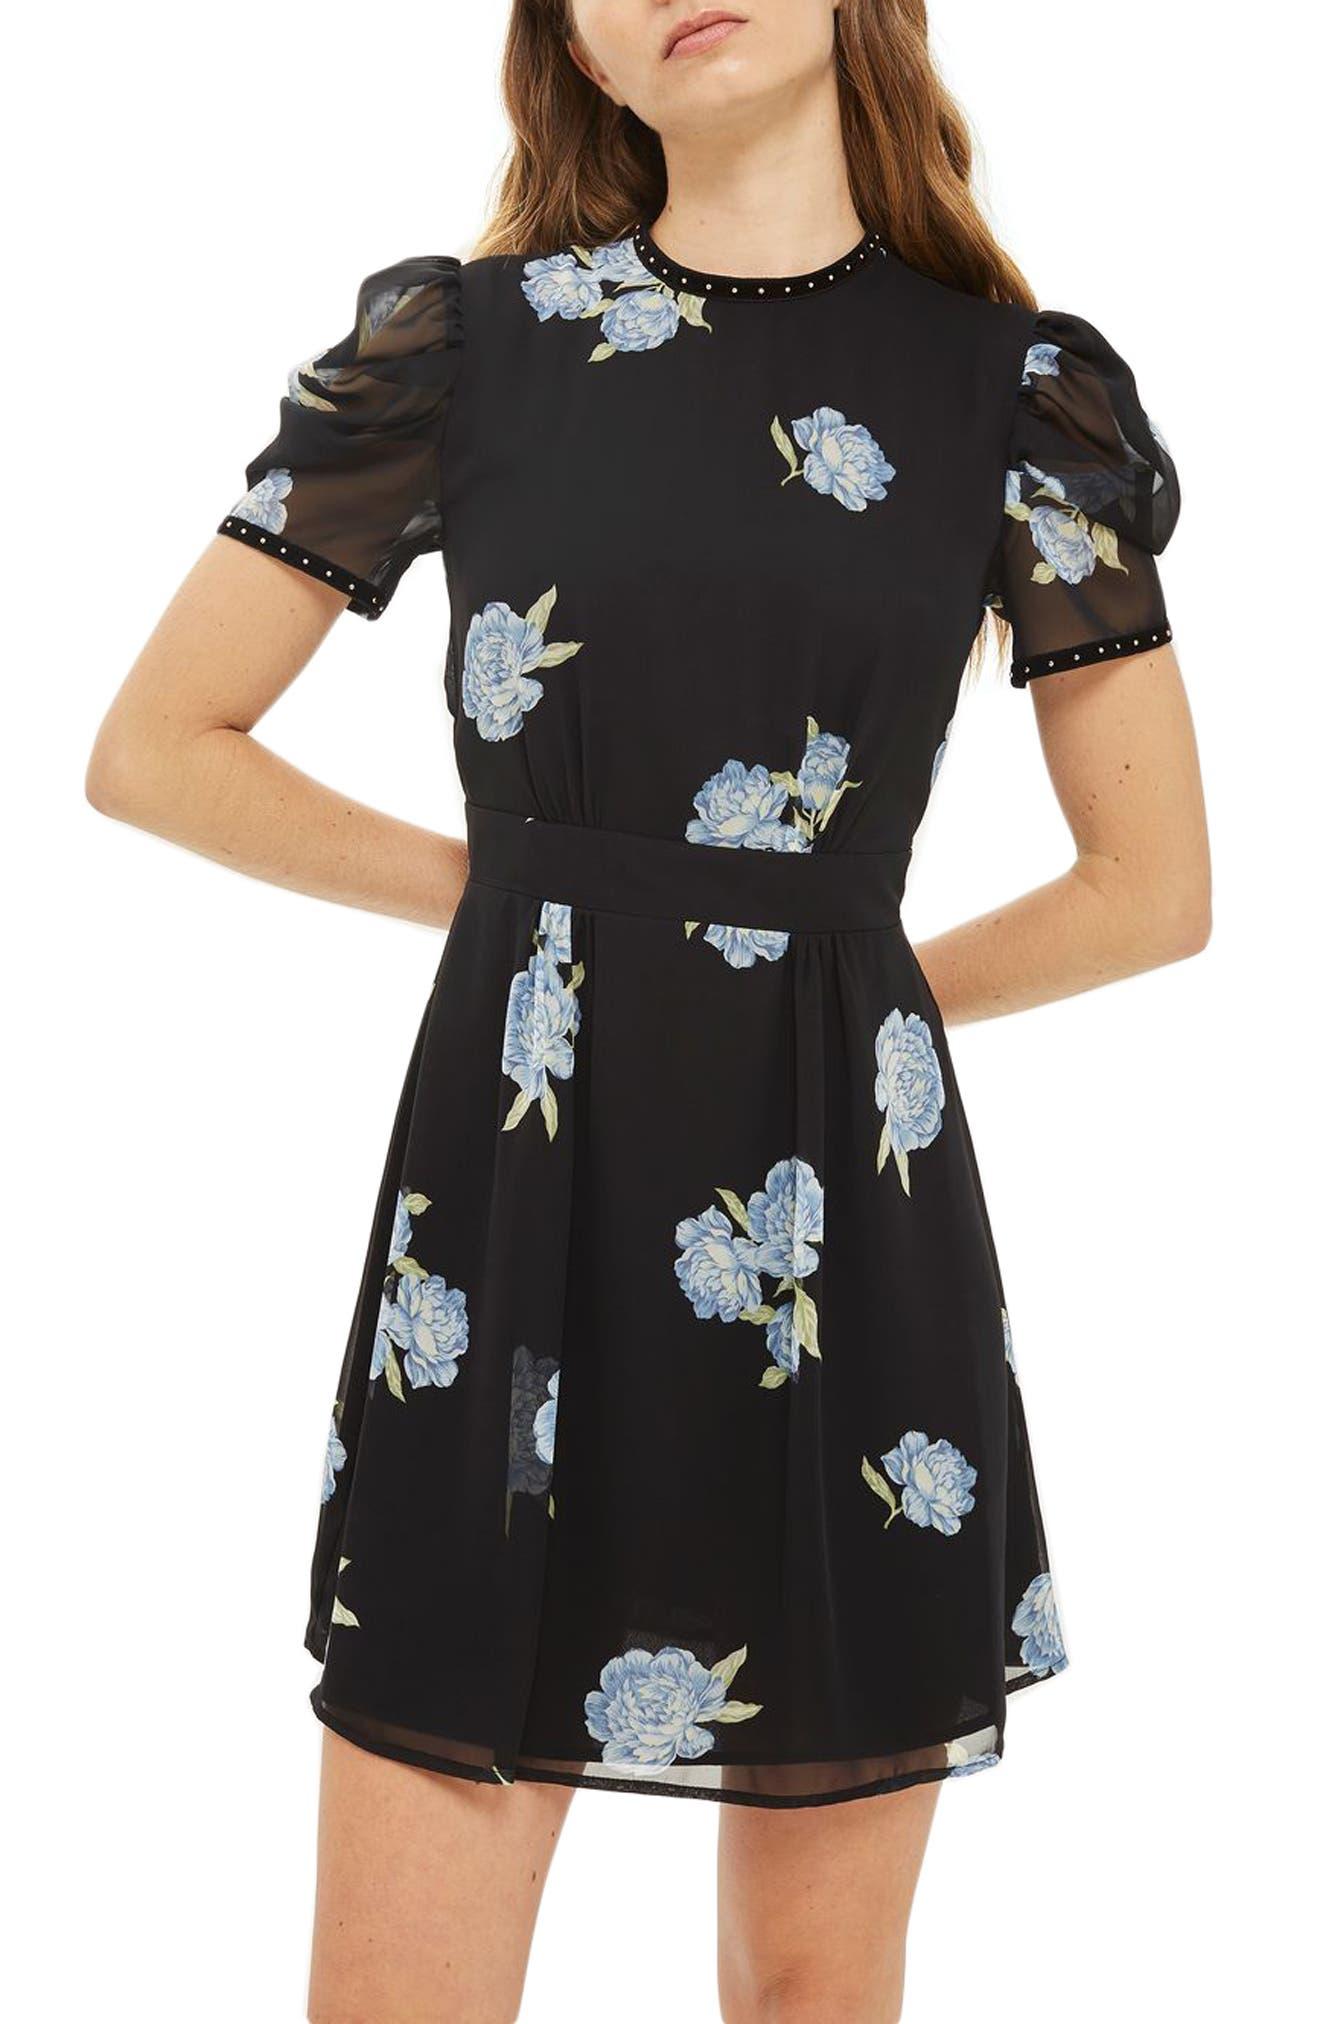 Bloom Studded Puff Sleeve Skater Dress,                         Main,                         color, Black Multi